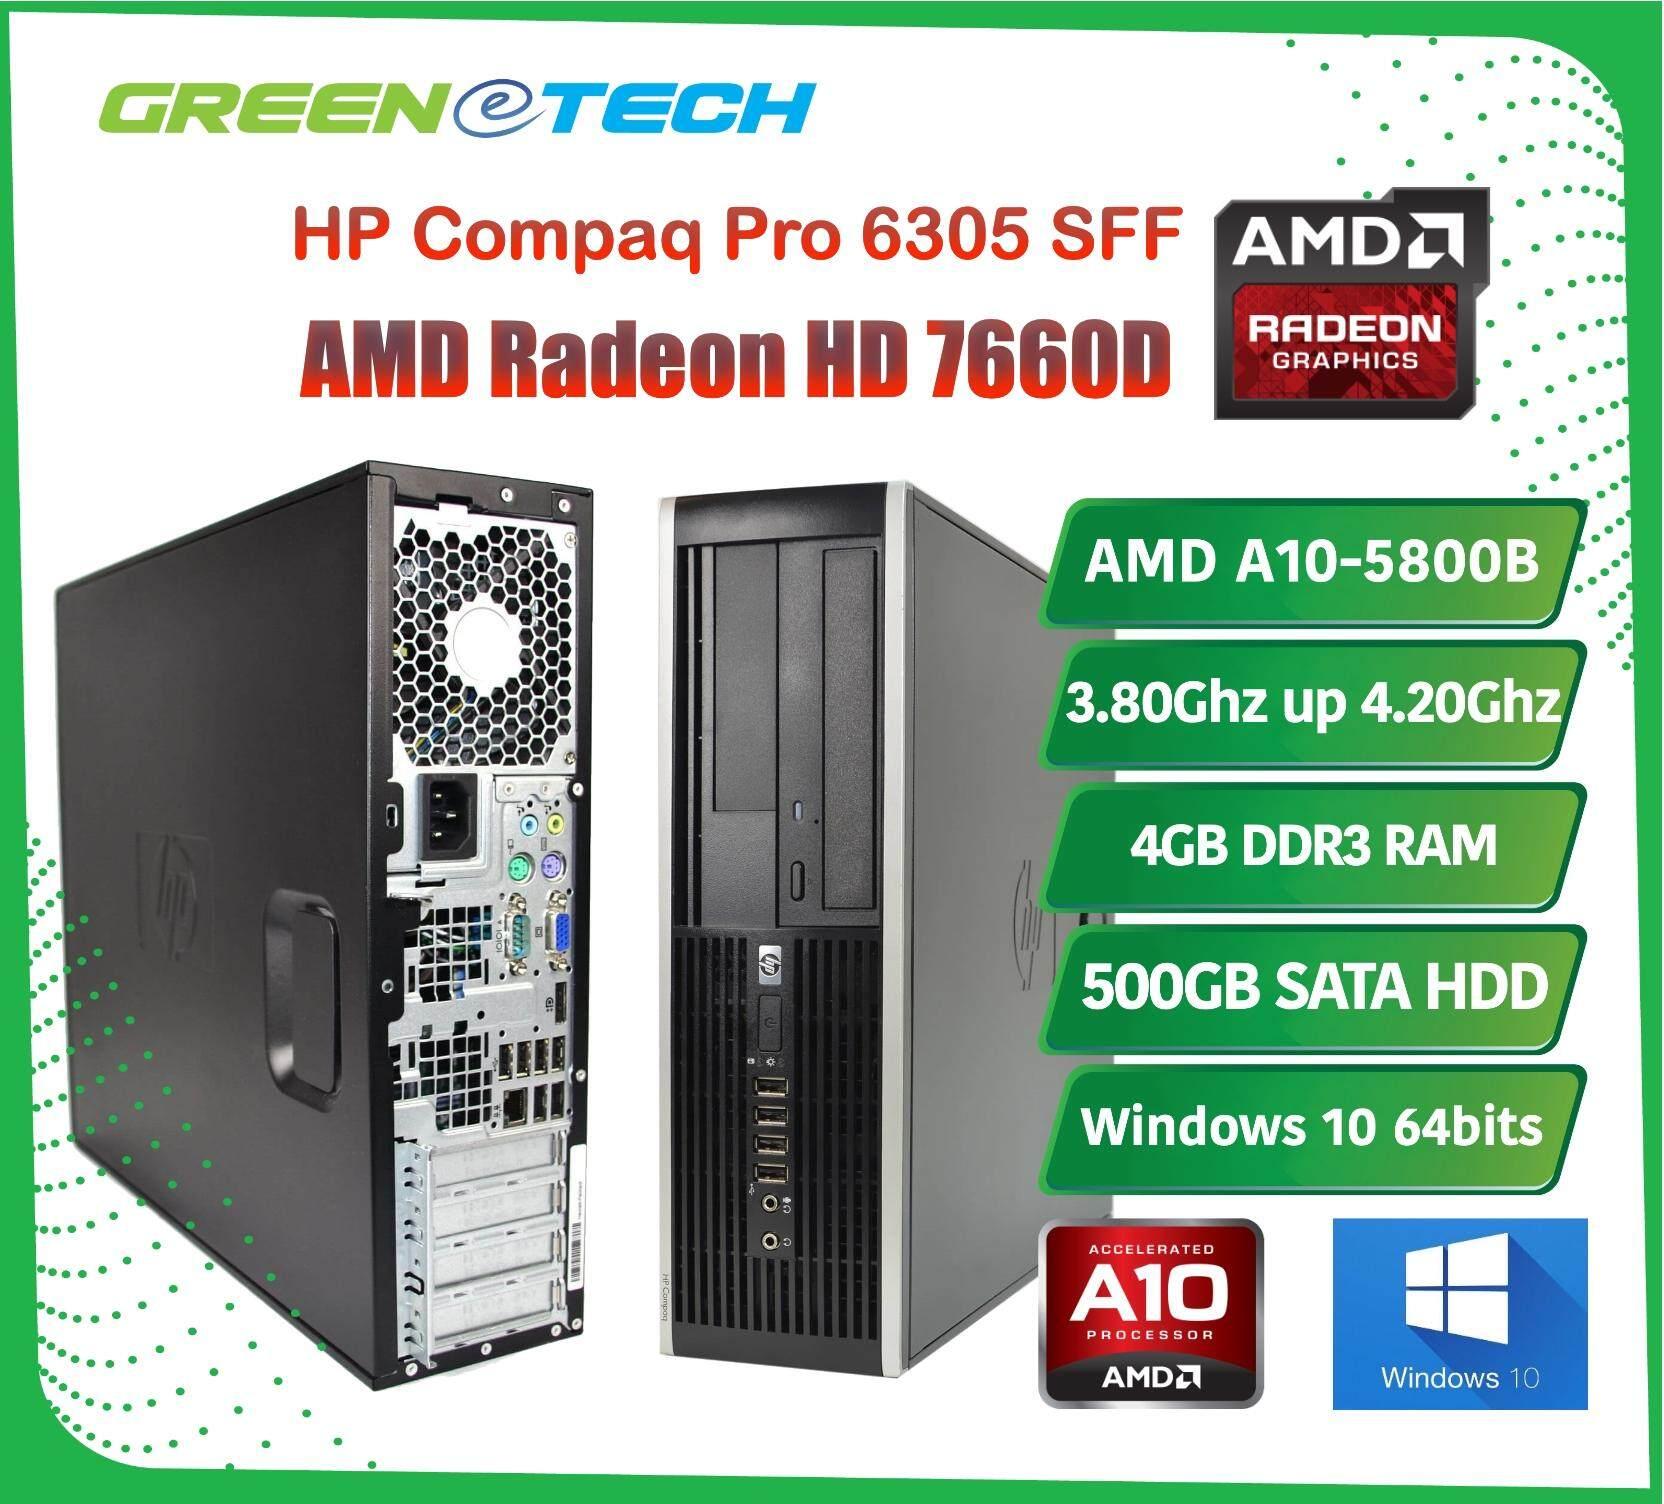 Refurbished HP Compaq Pro 6305 SFF Desktop AMD A10-5800B 3 8Ghz Up to  4 20Ghz Quad Core / 4GB DDR3 RAM / 500GB HDD / DVD-ROM / 3 Months Limited